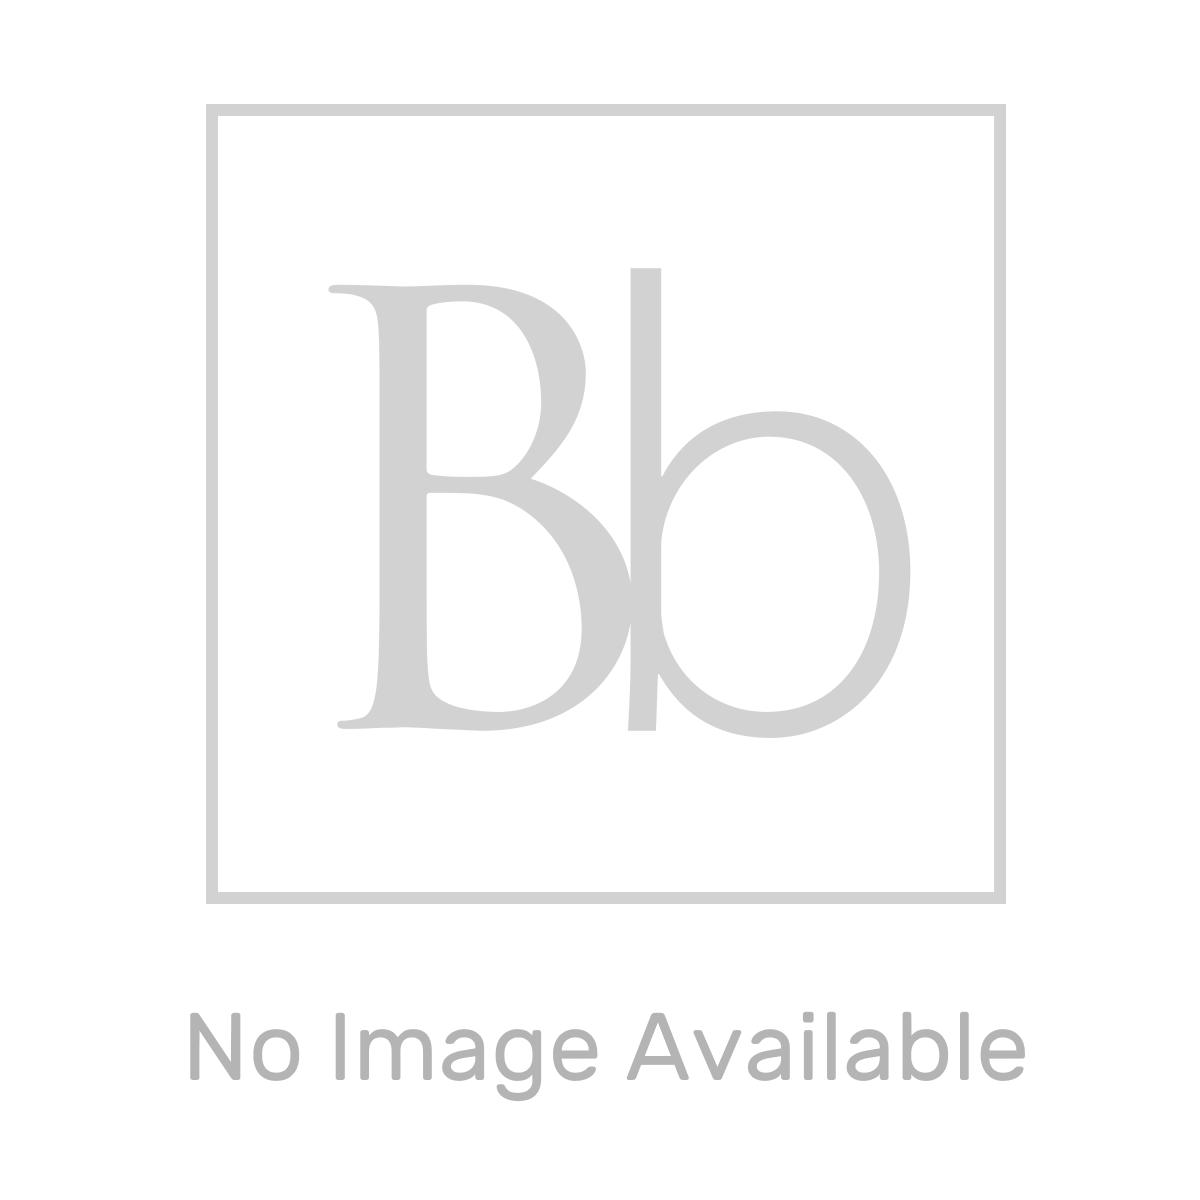 Kinedo Horizon Thermostatic Corner Pivot Self-Contained Shower Cubicle